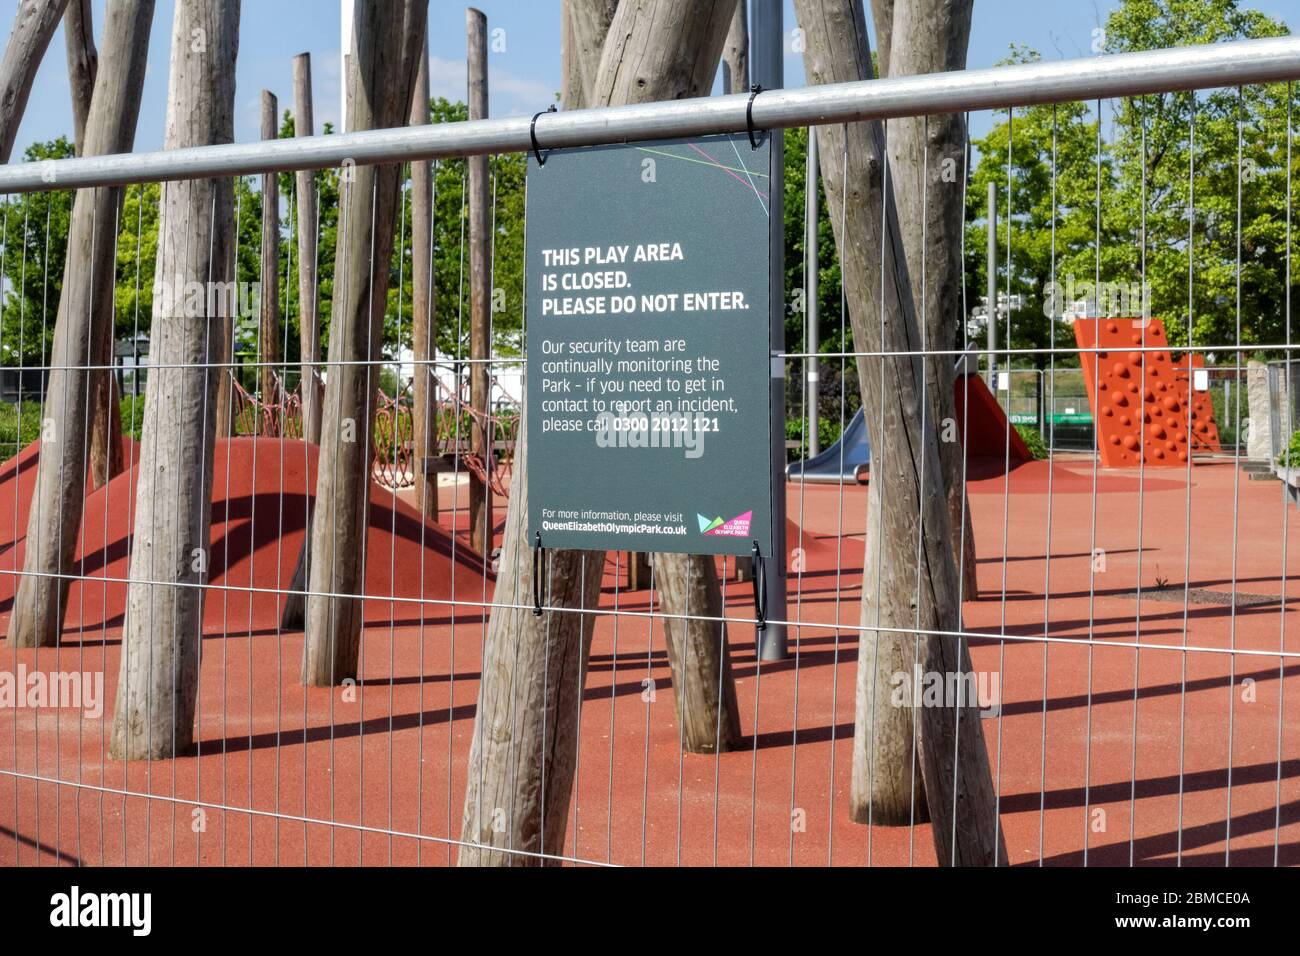 Playground area closed and cordoned off due to coronavirus outbreak, London, England United Kingdom UK Stock Photo